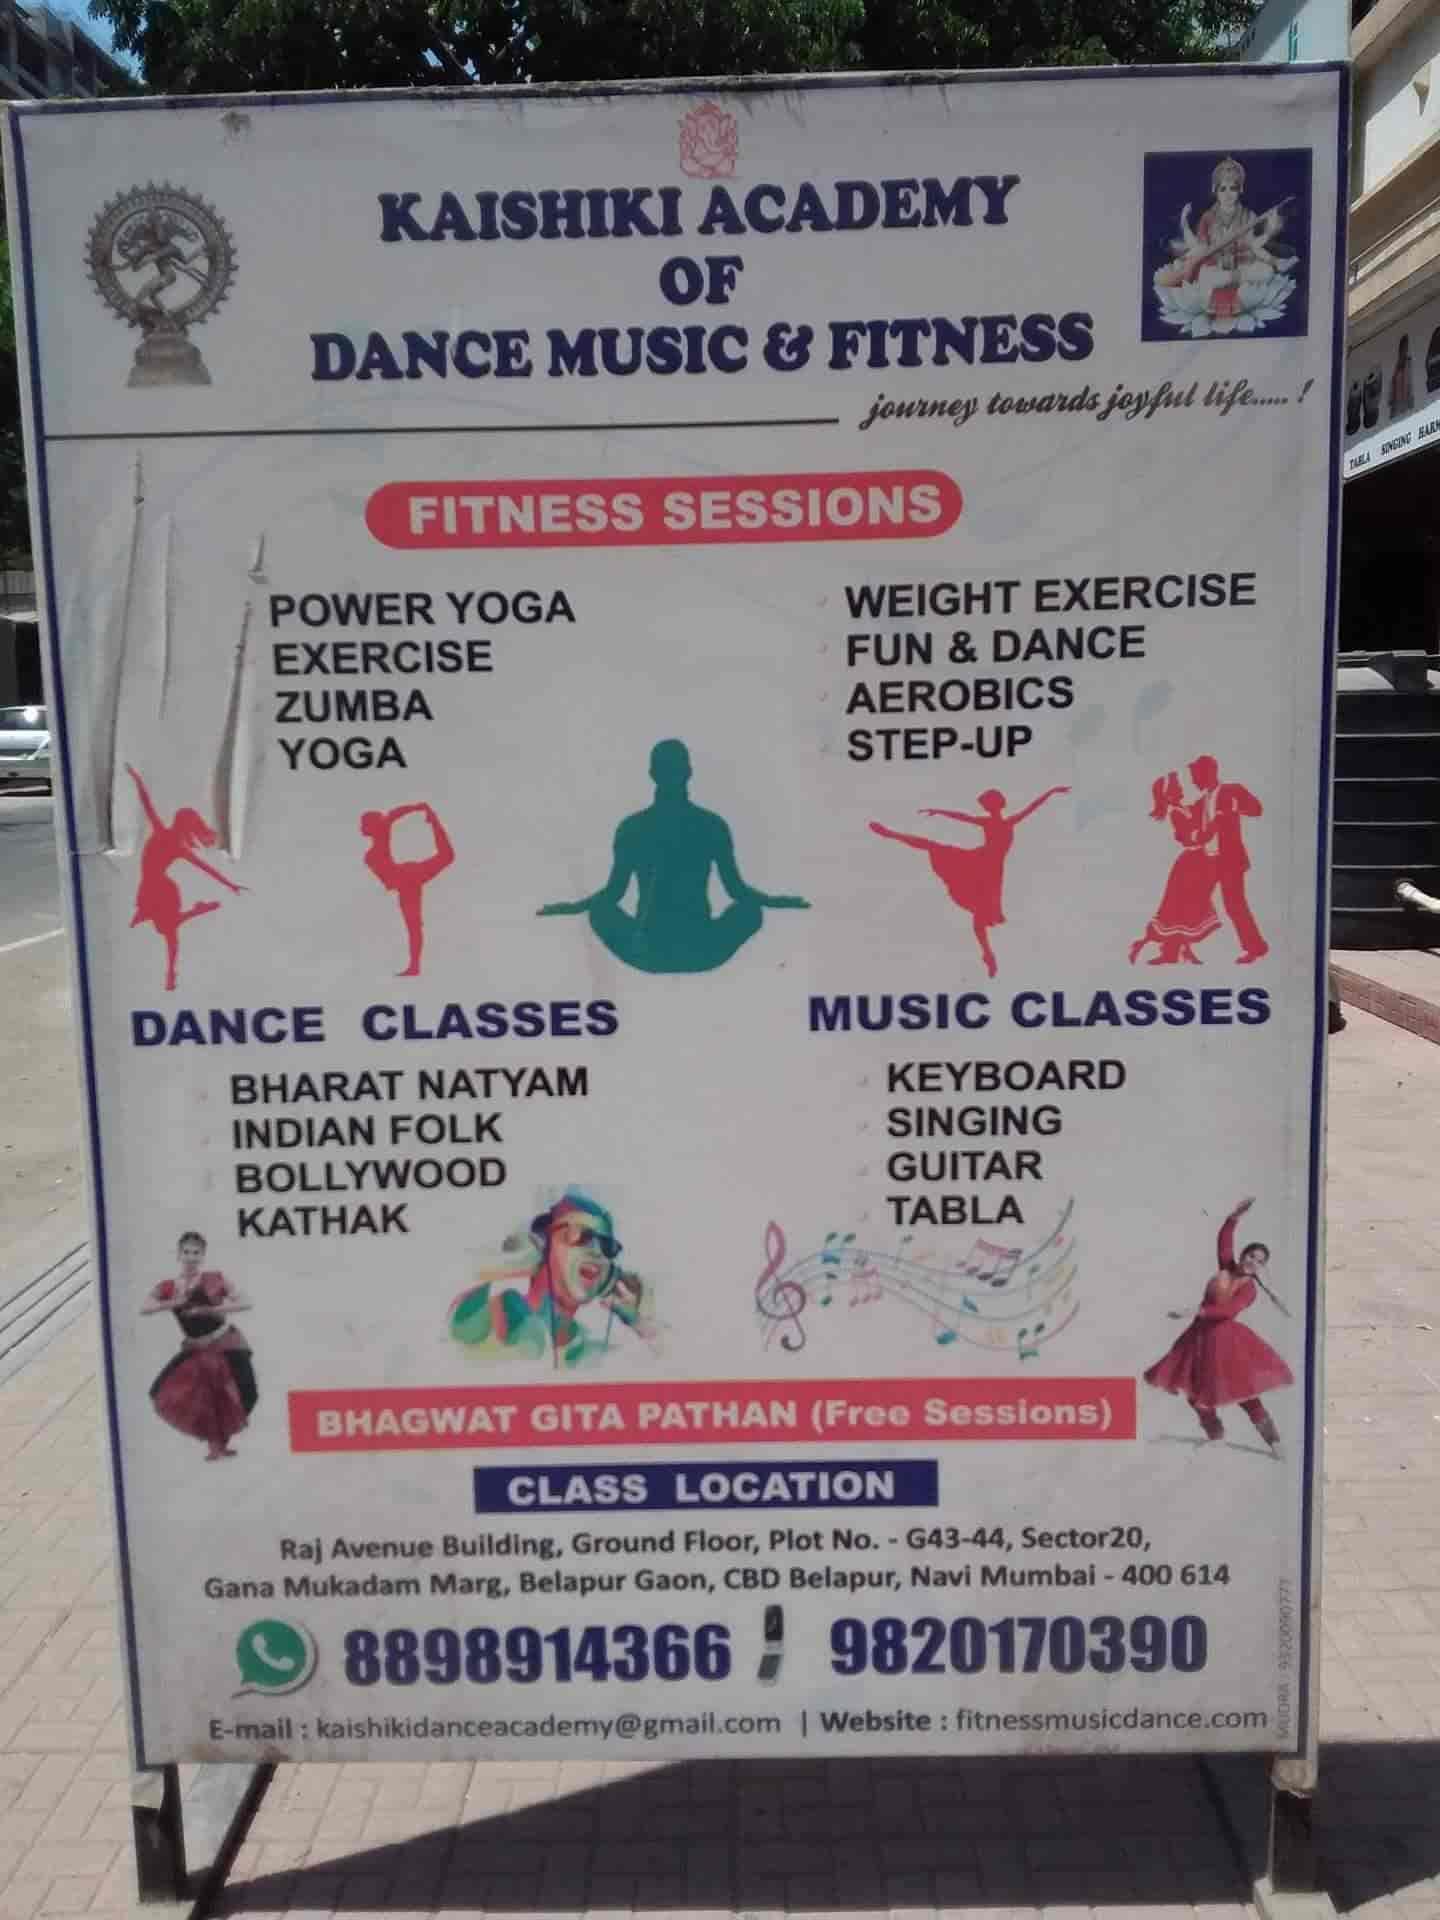 Kaishiki Academy Of Dance Music & Fitness, Cbd Belapur